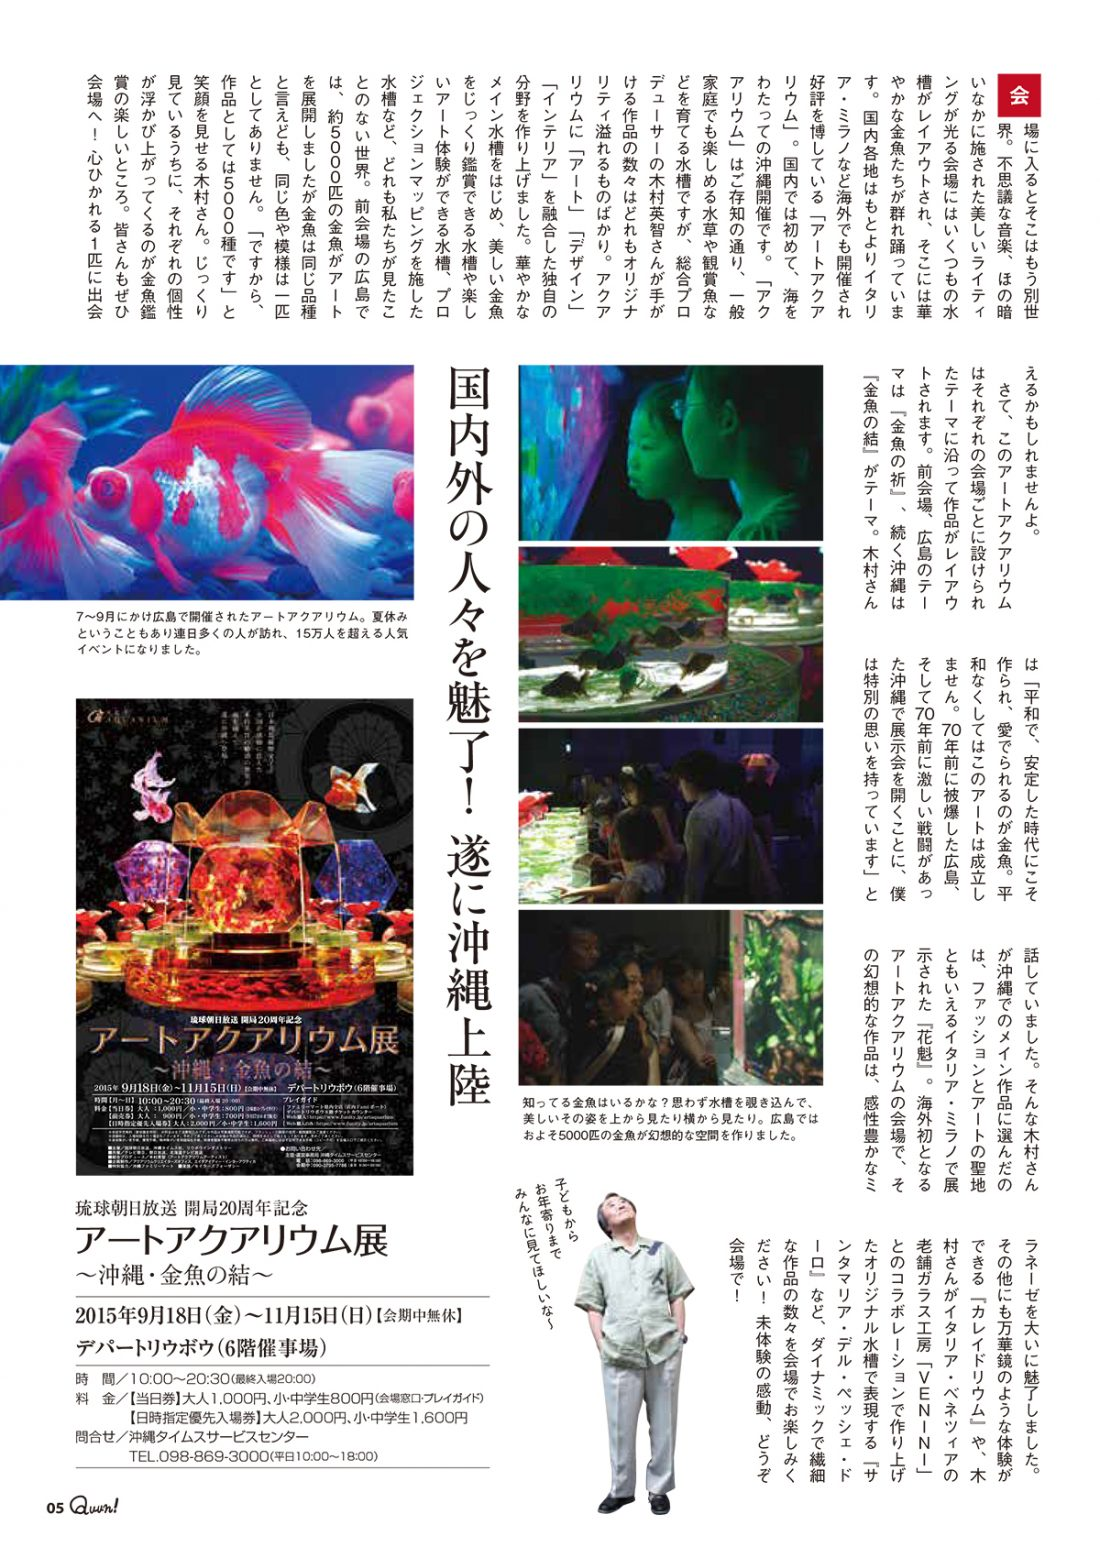 https://www.qab.co.jp/qgoro/wp-content/uploads/quun_0407-1100x1558.jpg